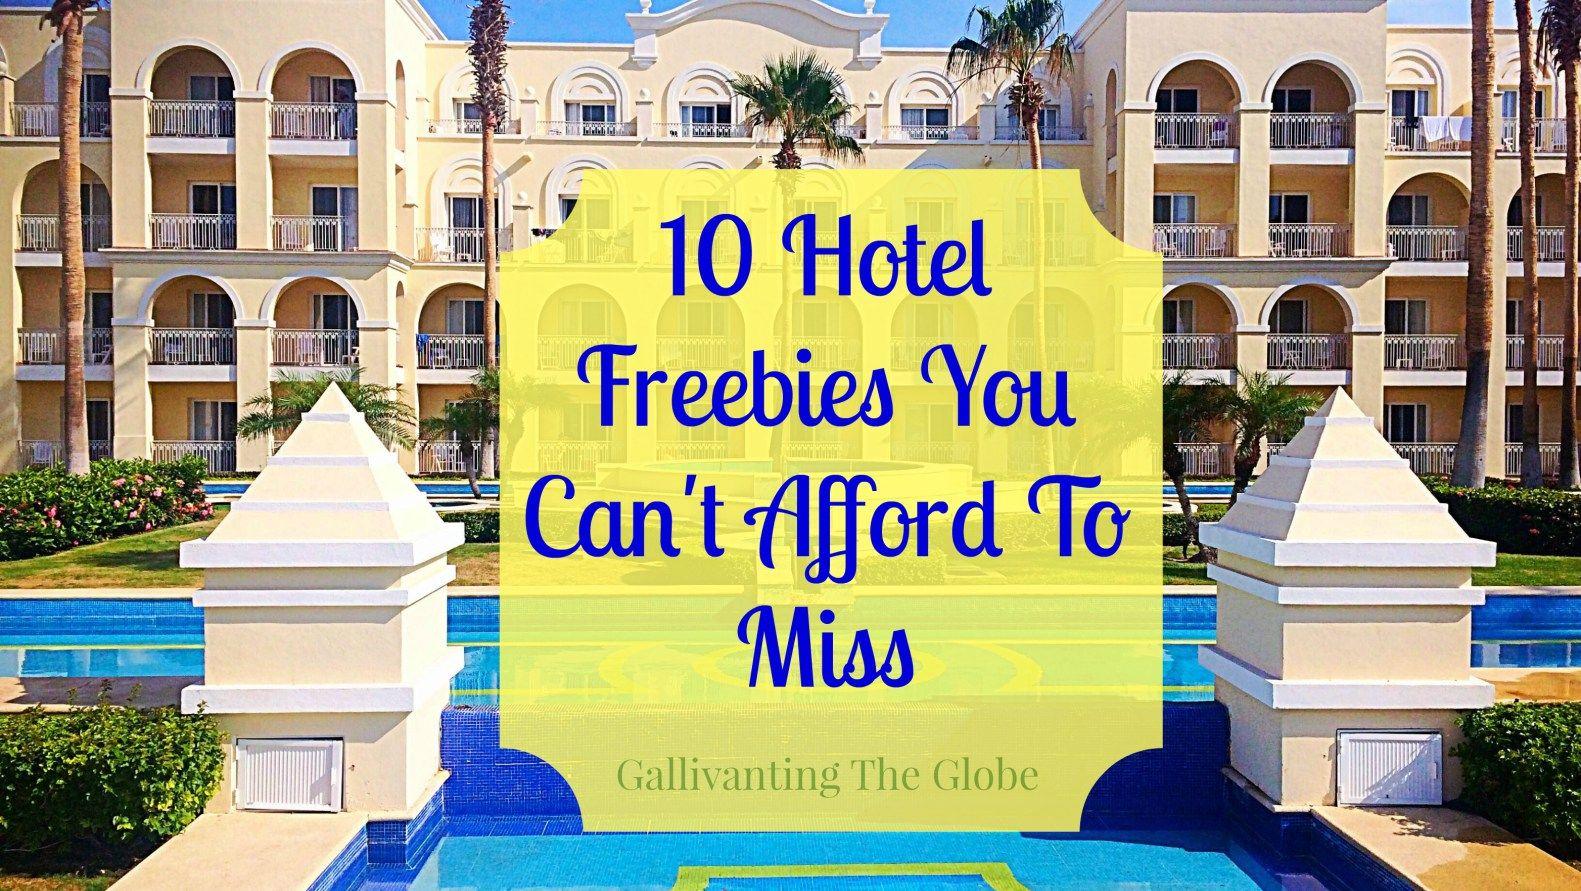 Casino freebies guide best way to playthrough casino bonus